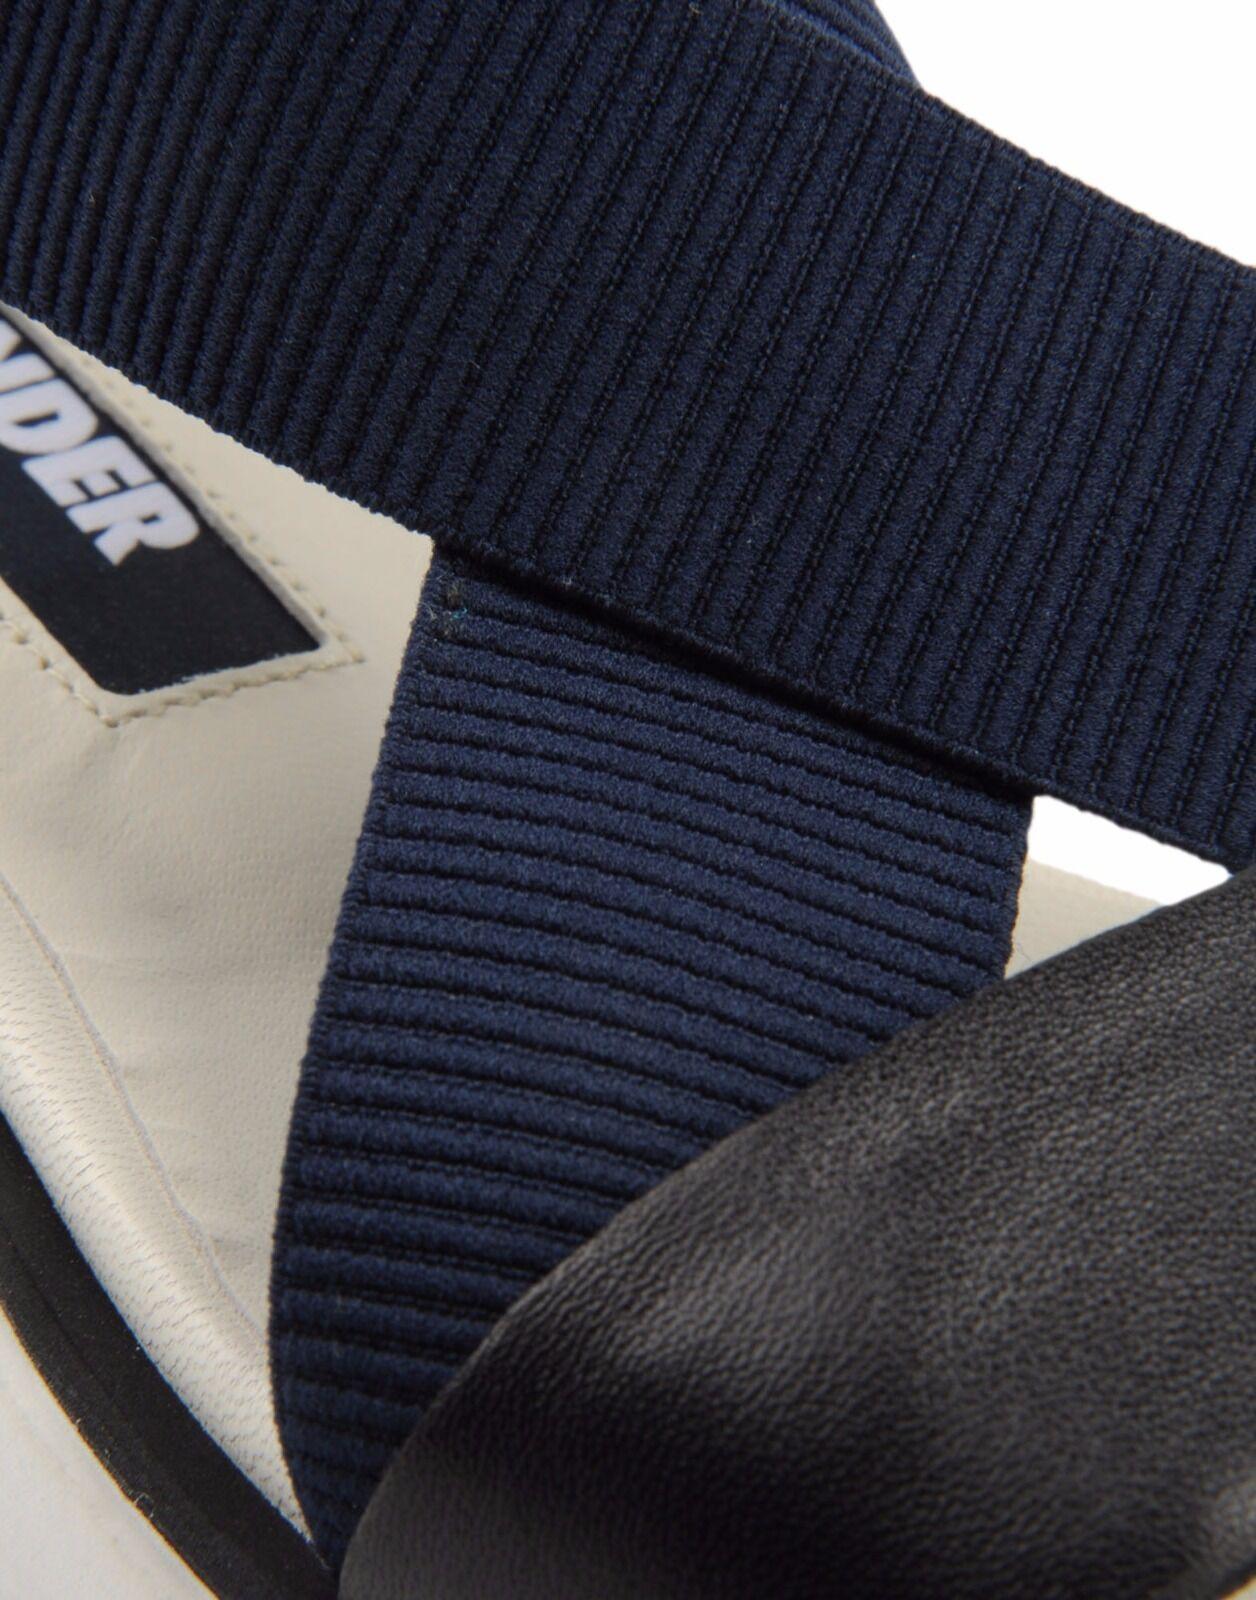 Jil Jil Jil Sander Navy Flat Platform Sandals 37 7 SOLD OUT